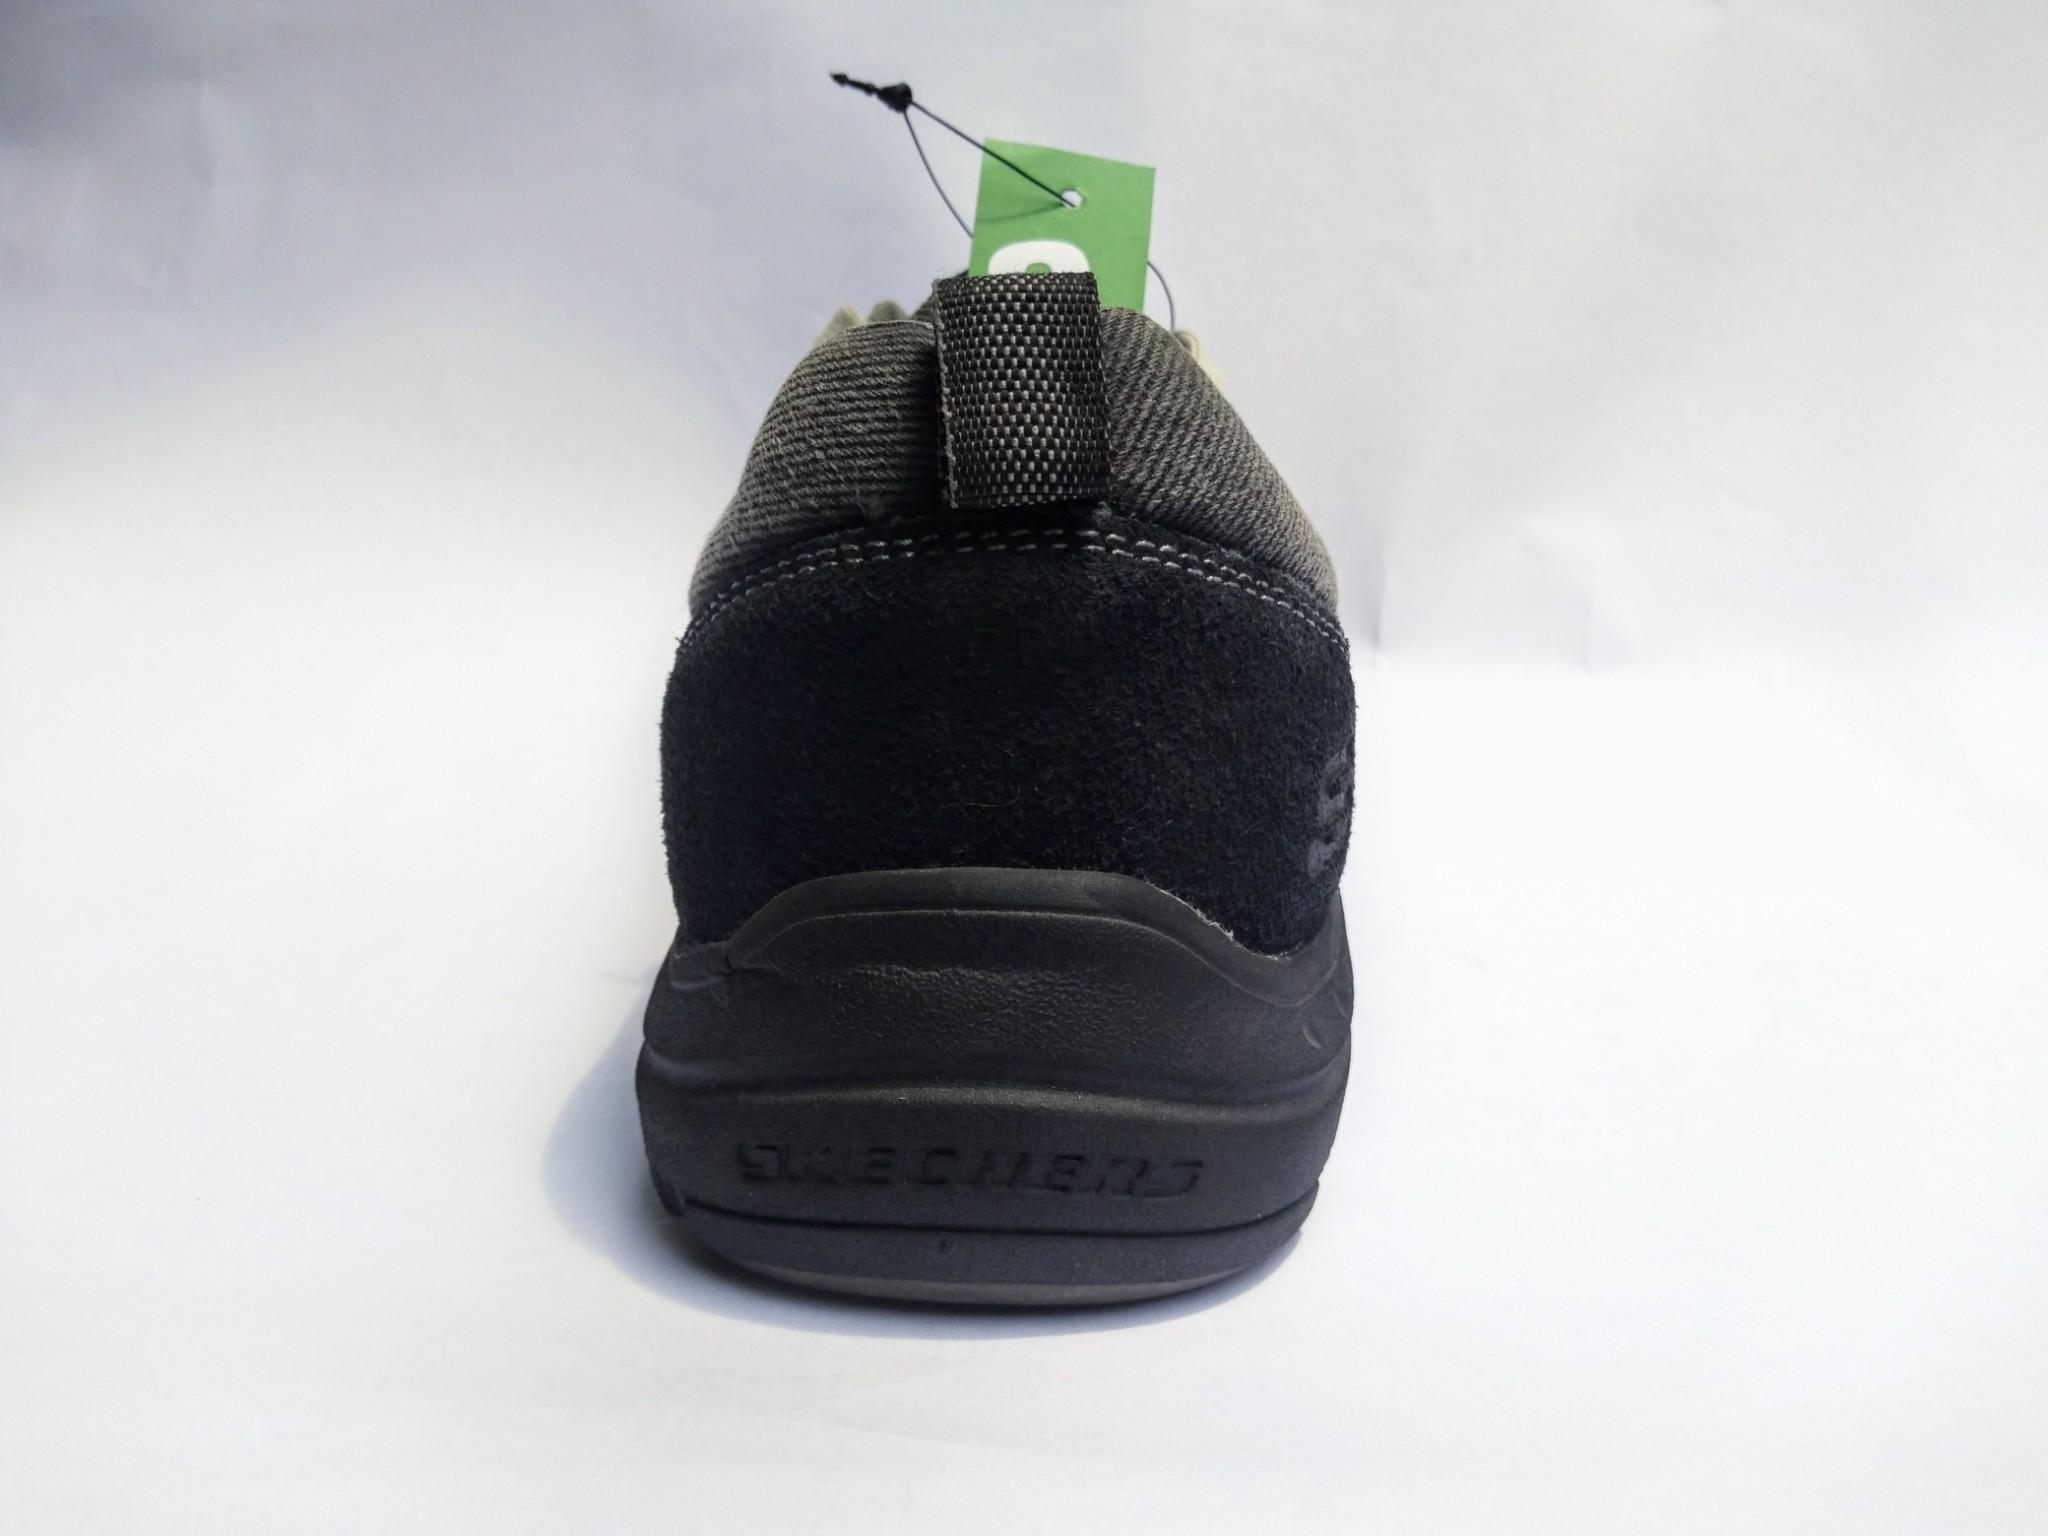 giày sneaker skecher big size 11us 12us 13us 14us